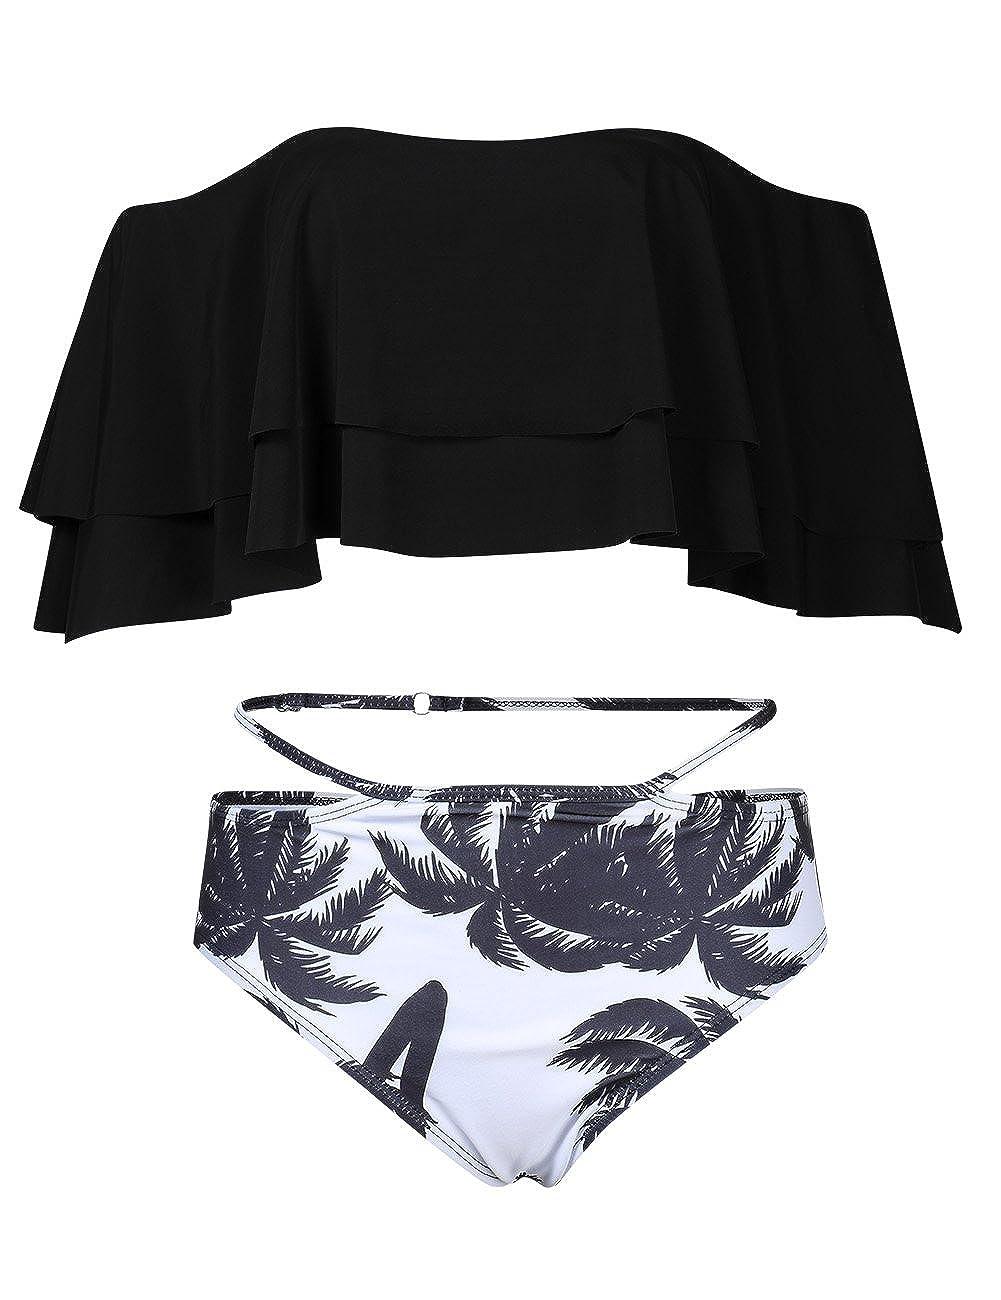 01617001a4 Chic Bikini Set: Removable padding wireless adjustable thin shoulder straps  ruffle bikini crop top + Inclined stripes ruched high waisted bikini bottom.